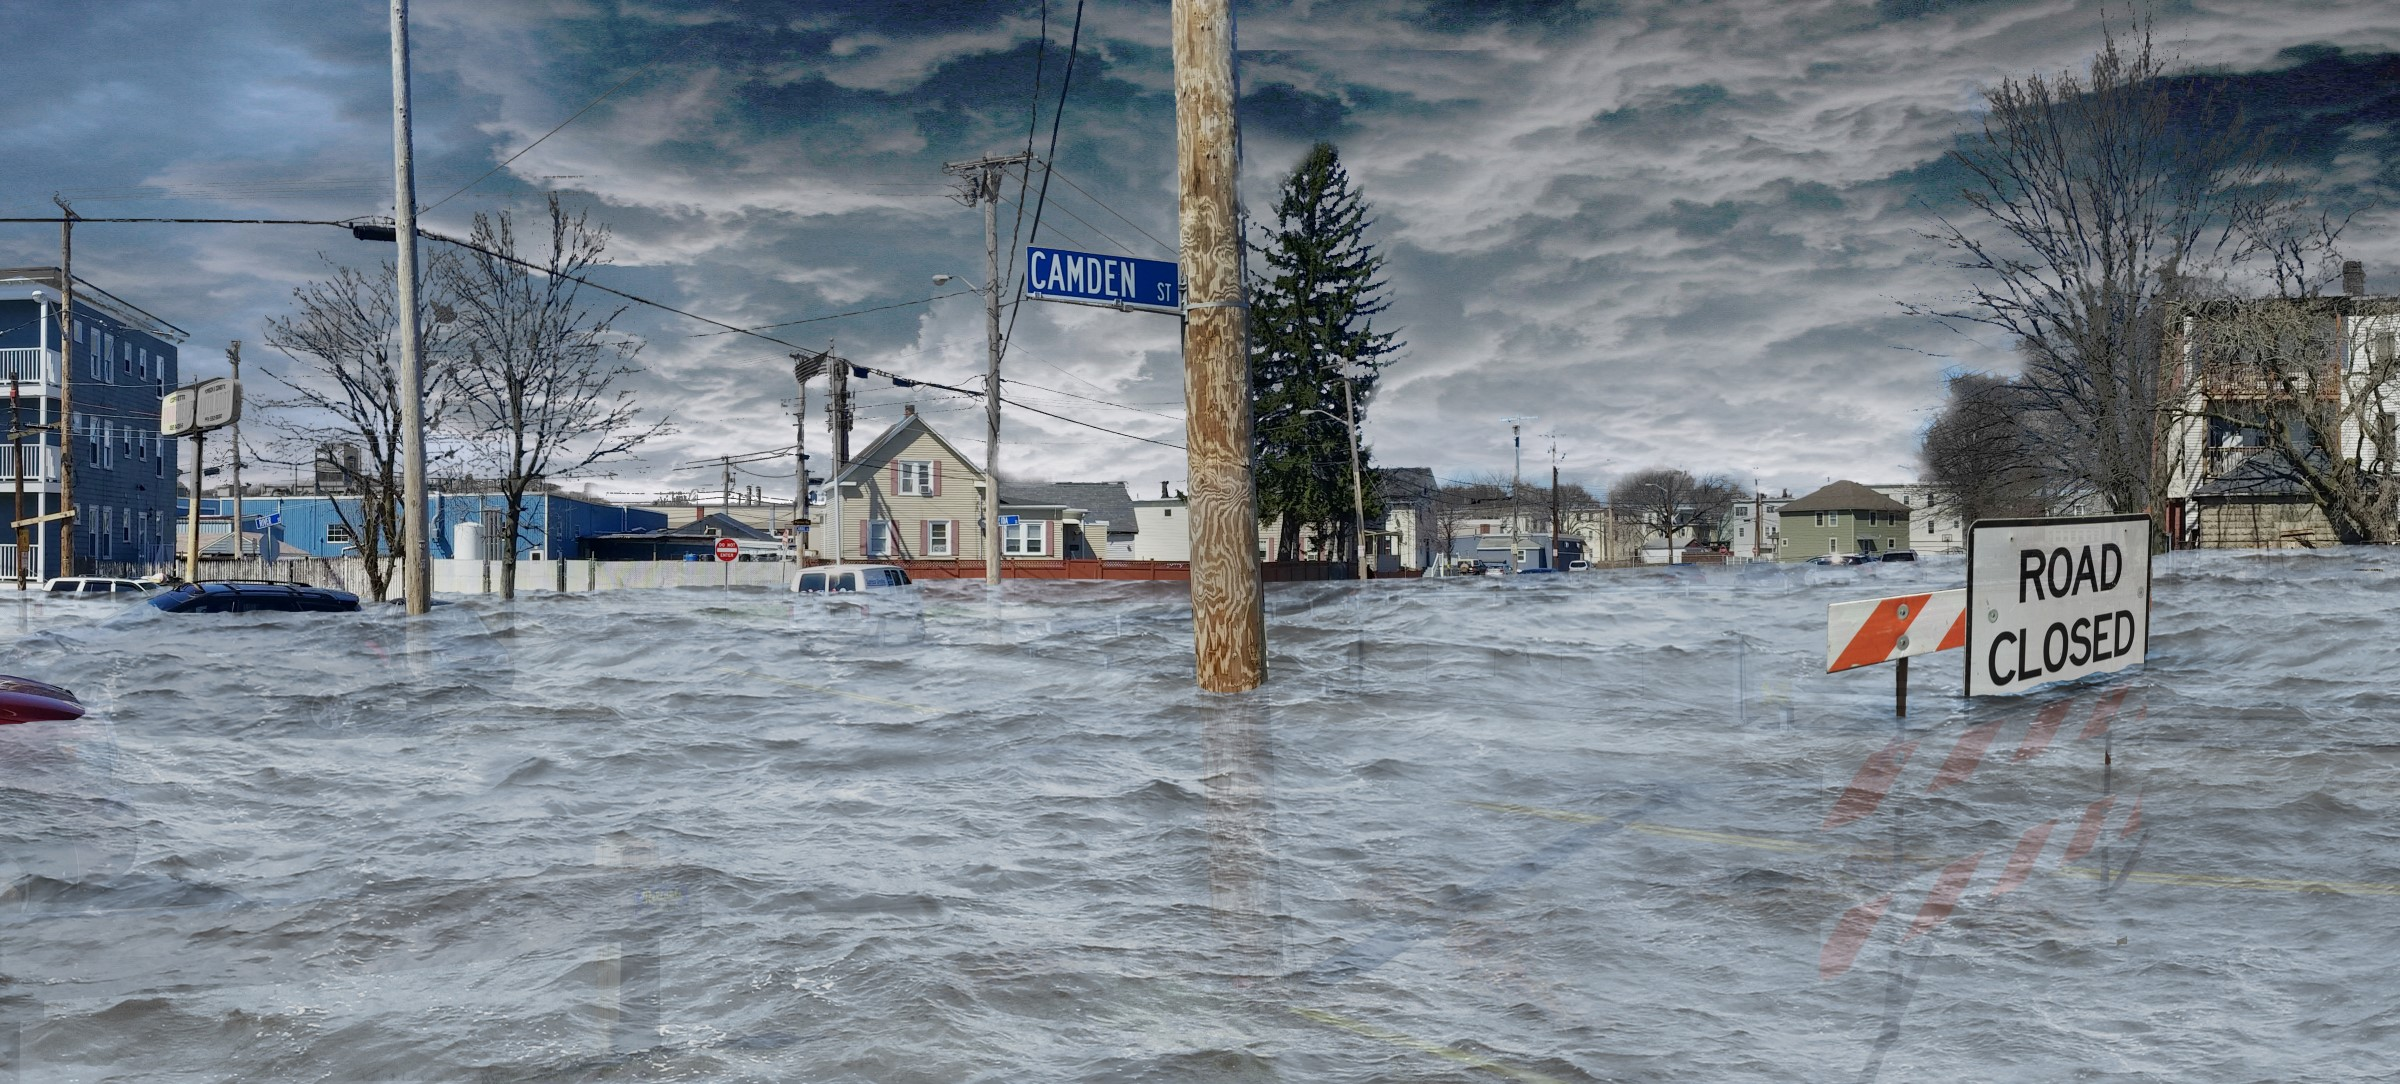 Lynn Coastal Zone Management camden street inundation happier